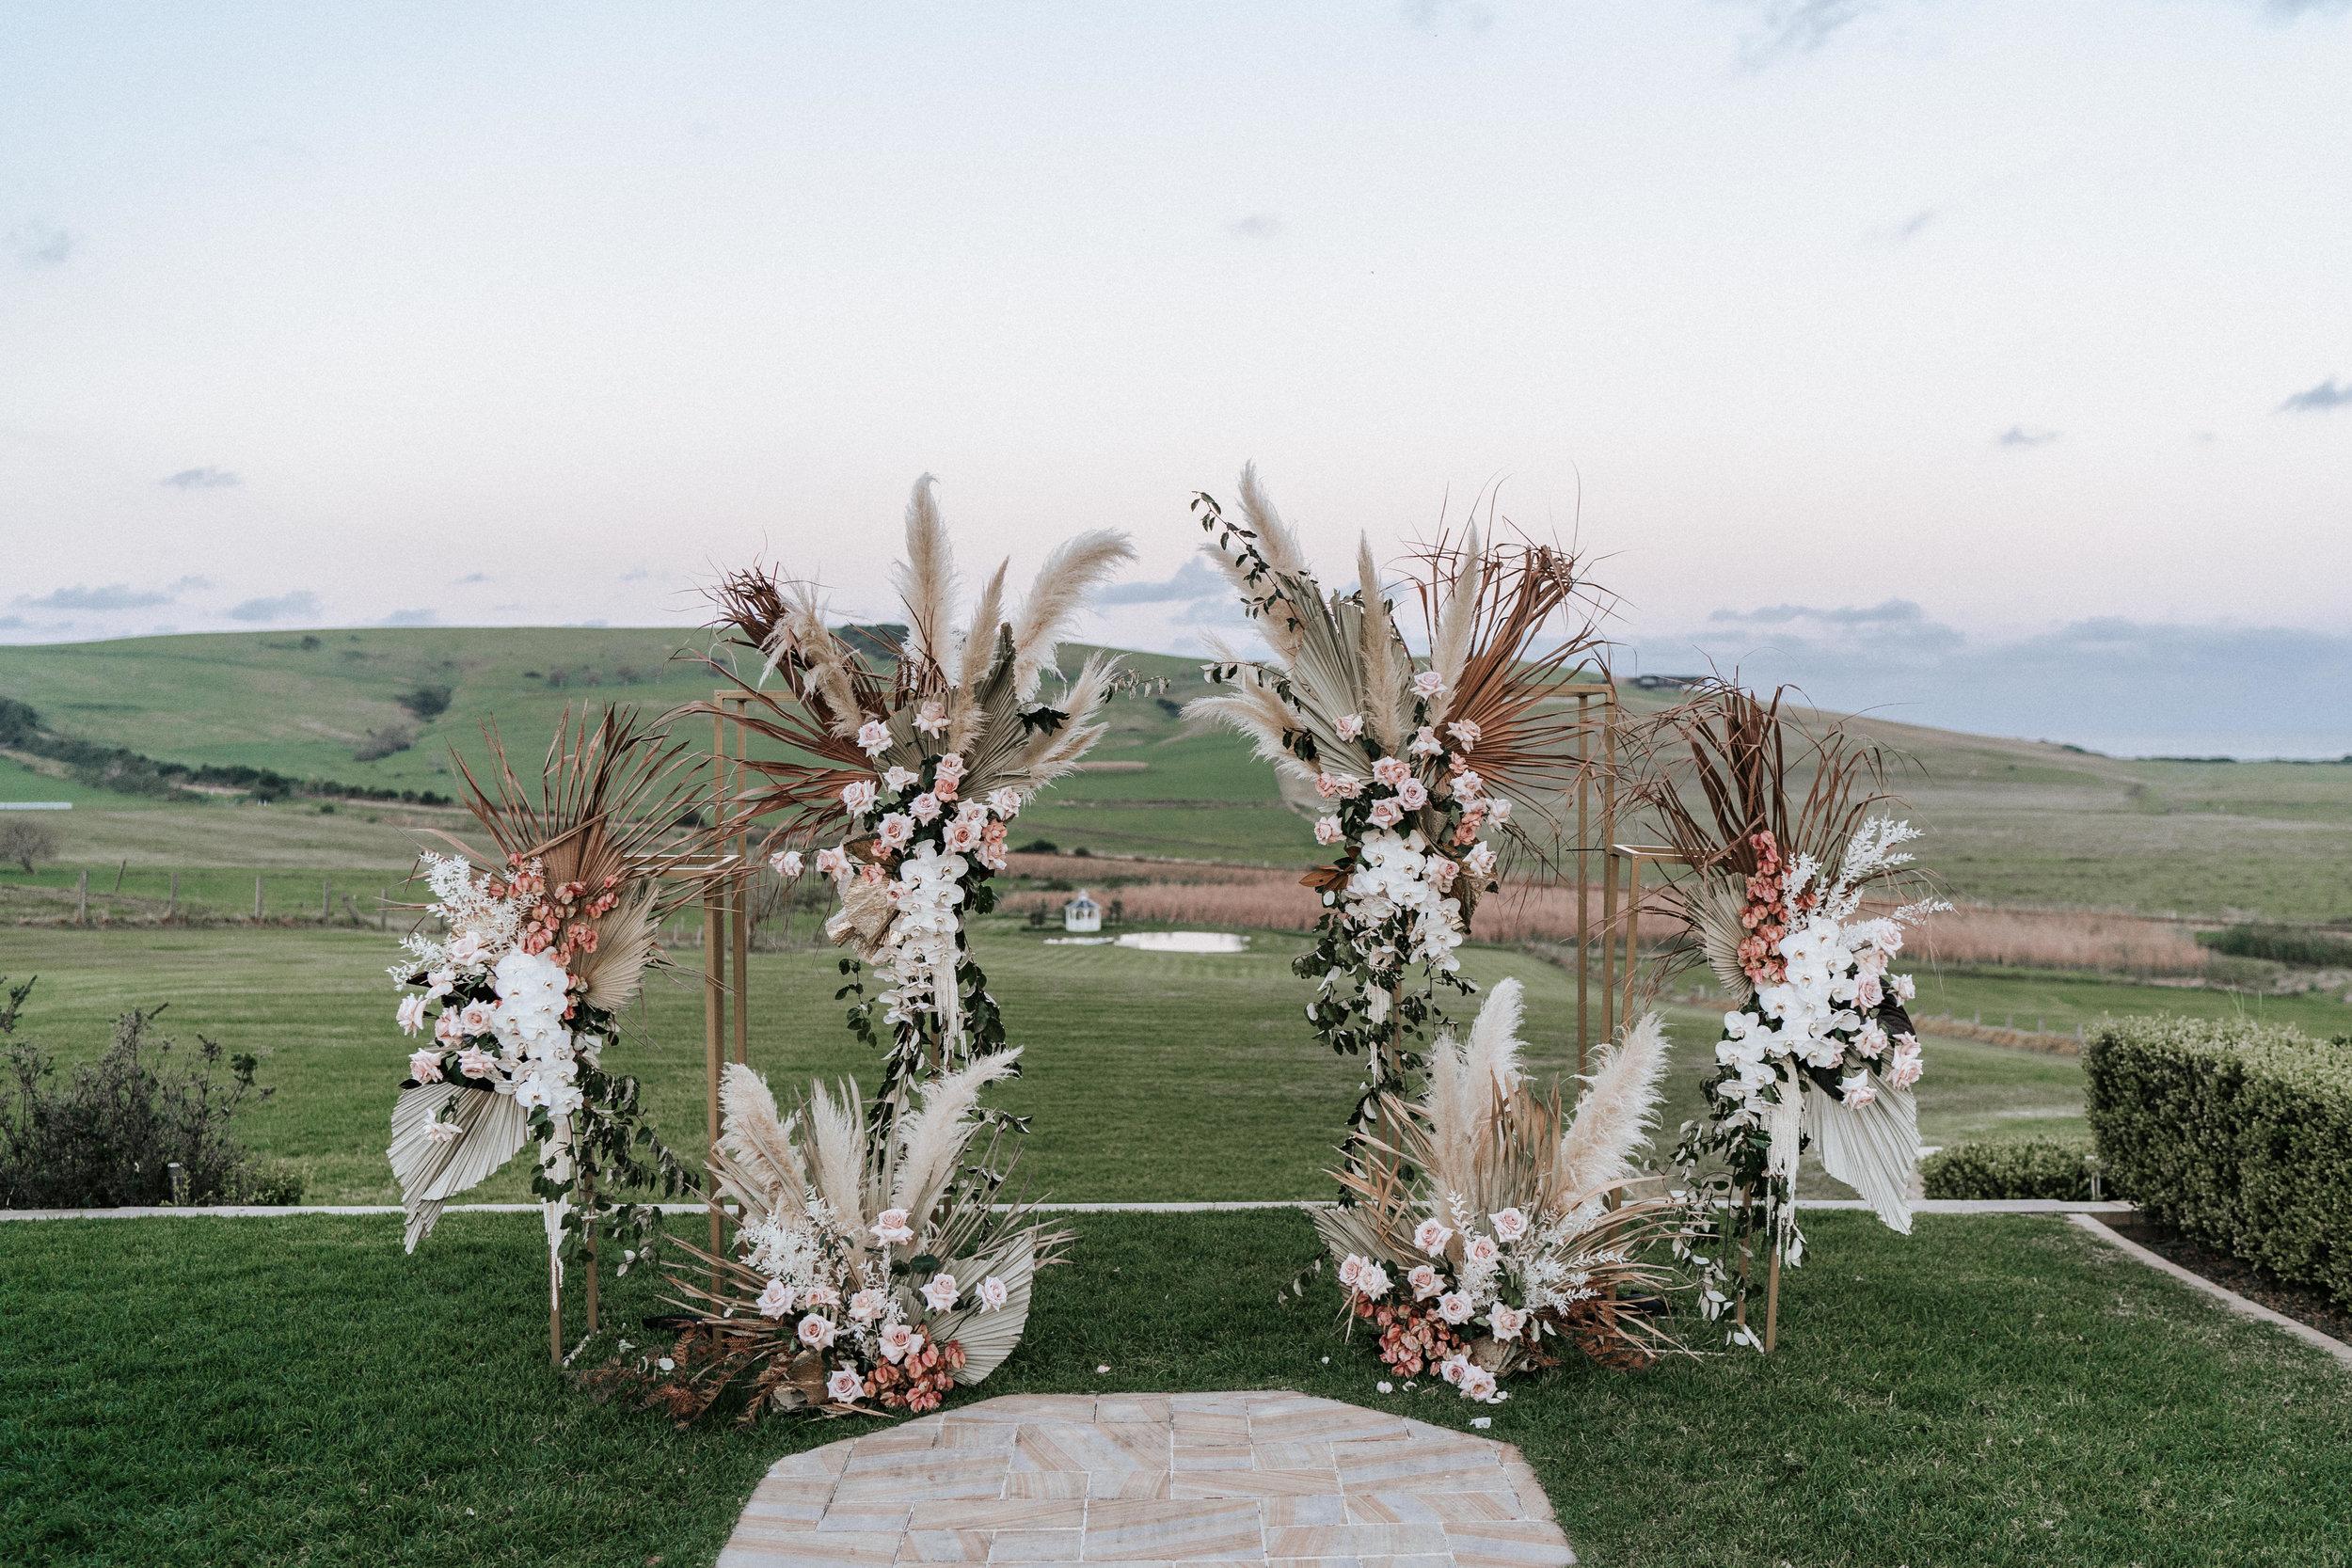 gemaya-tim-bilmon-wedding-841.jpg